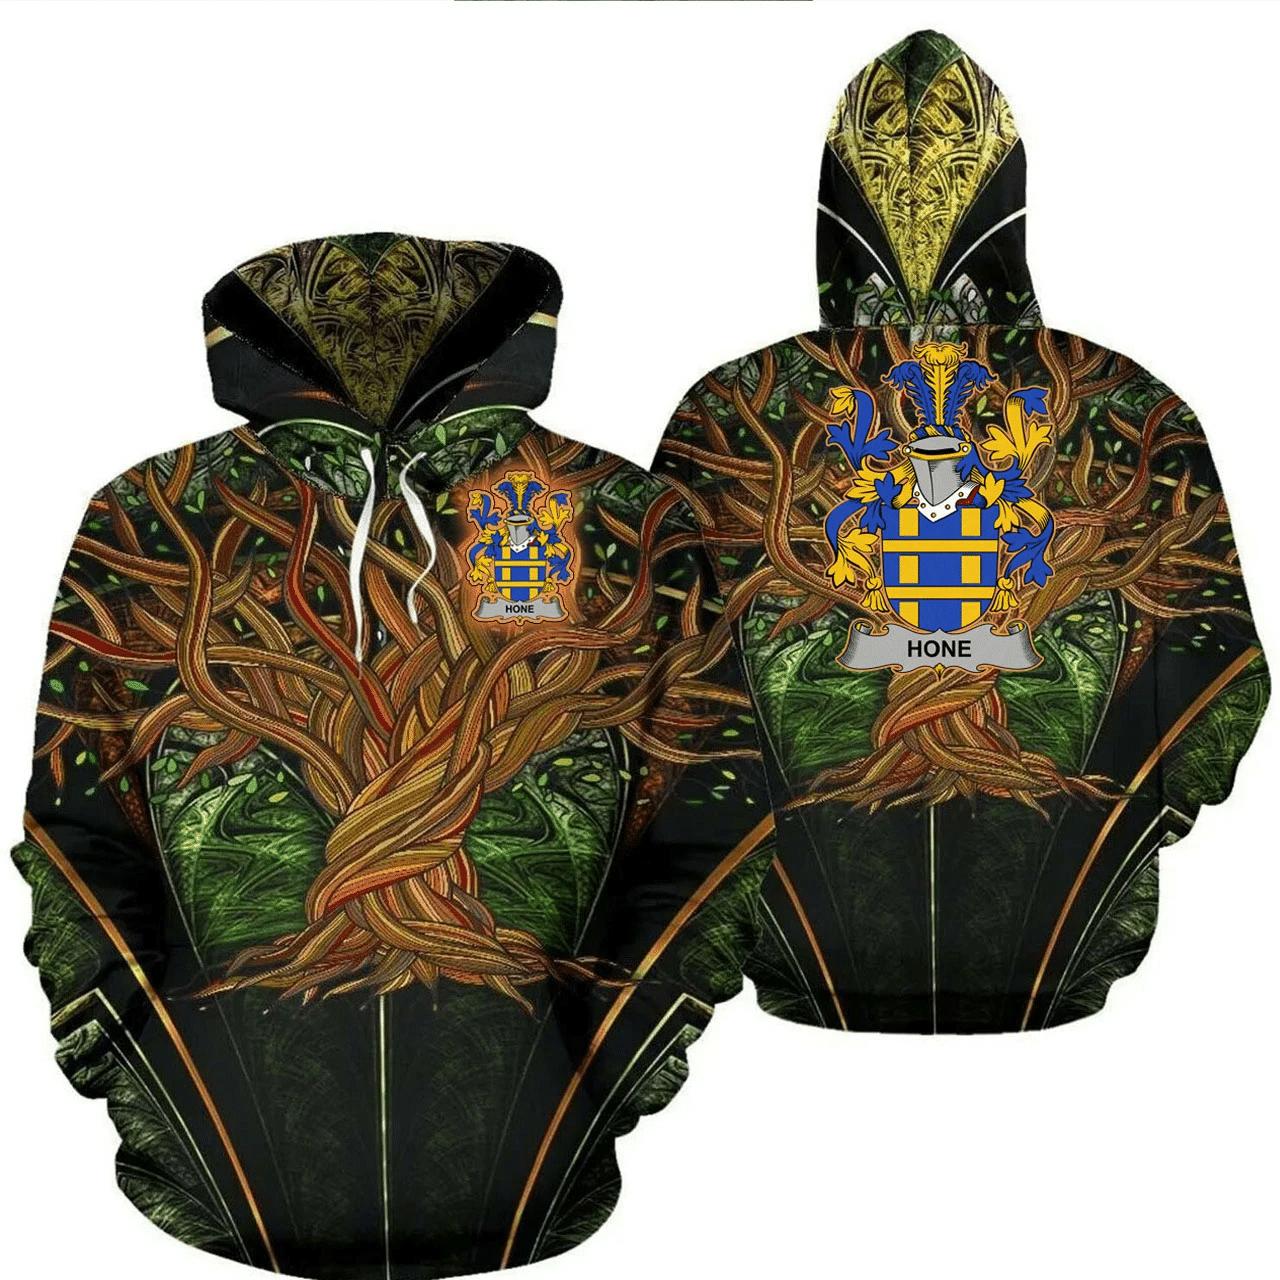 1stIreland Ireland Hoodie - Hone or O'Hone Irish Family Crest Hoodie - Tree Of Life A7